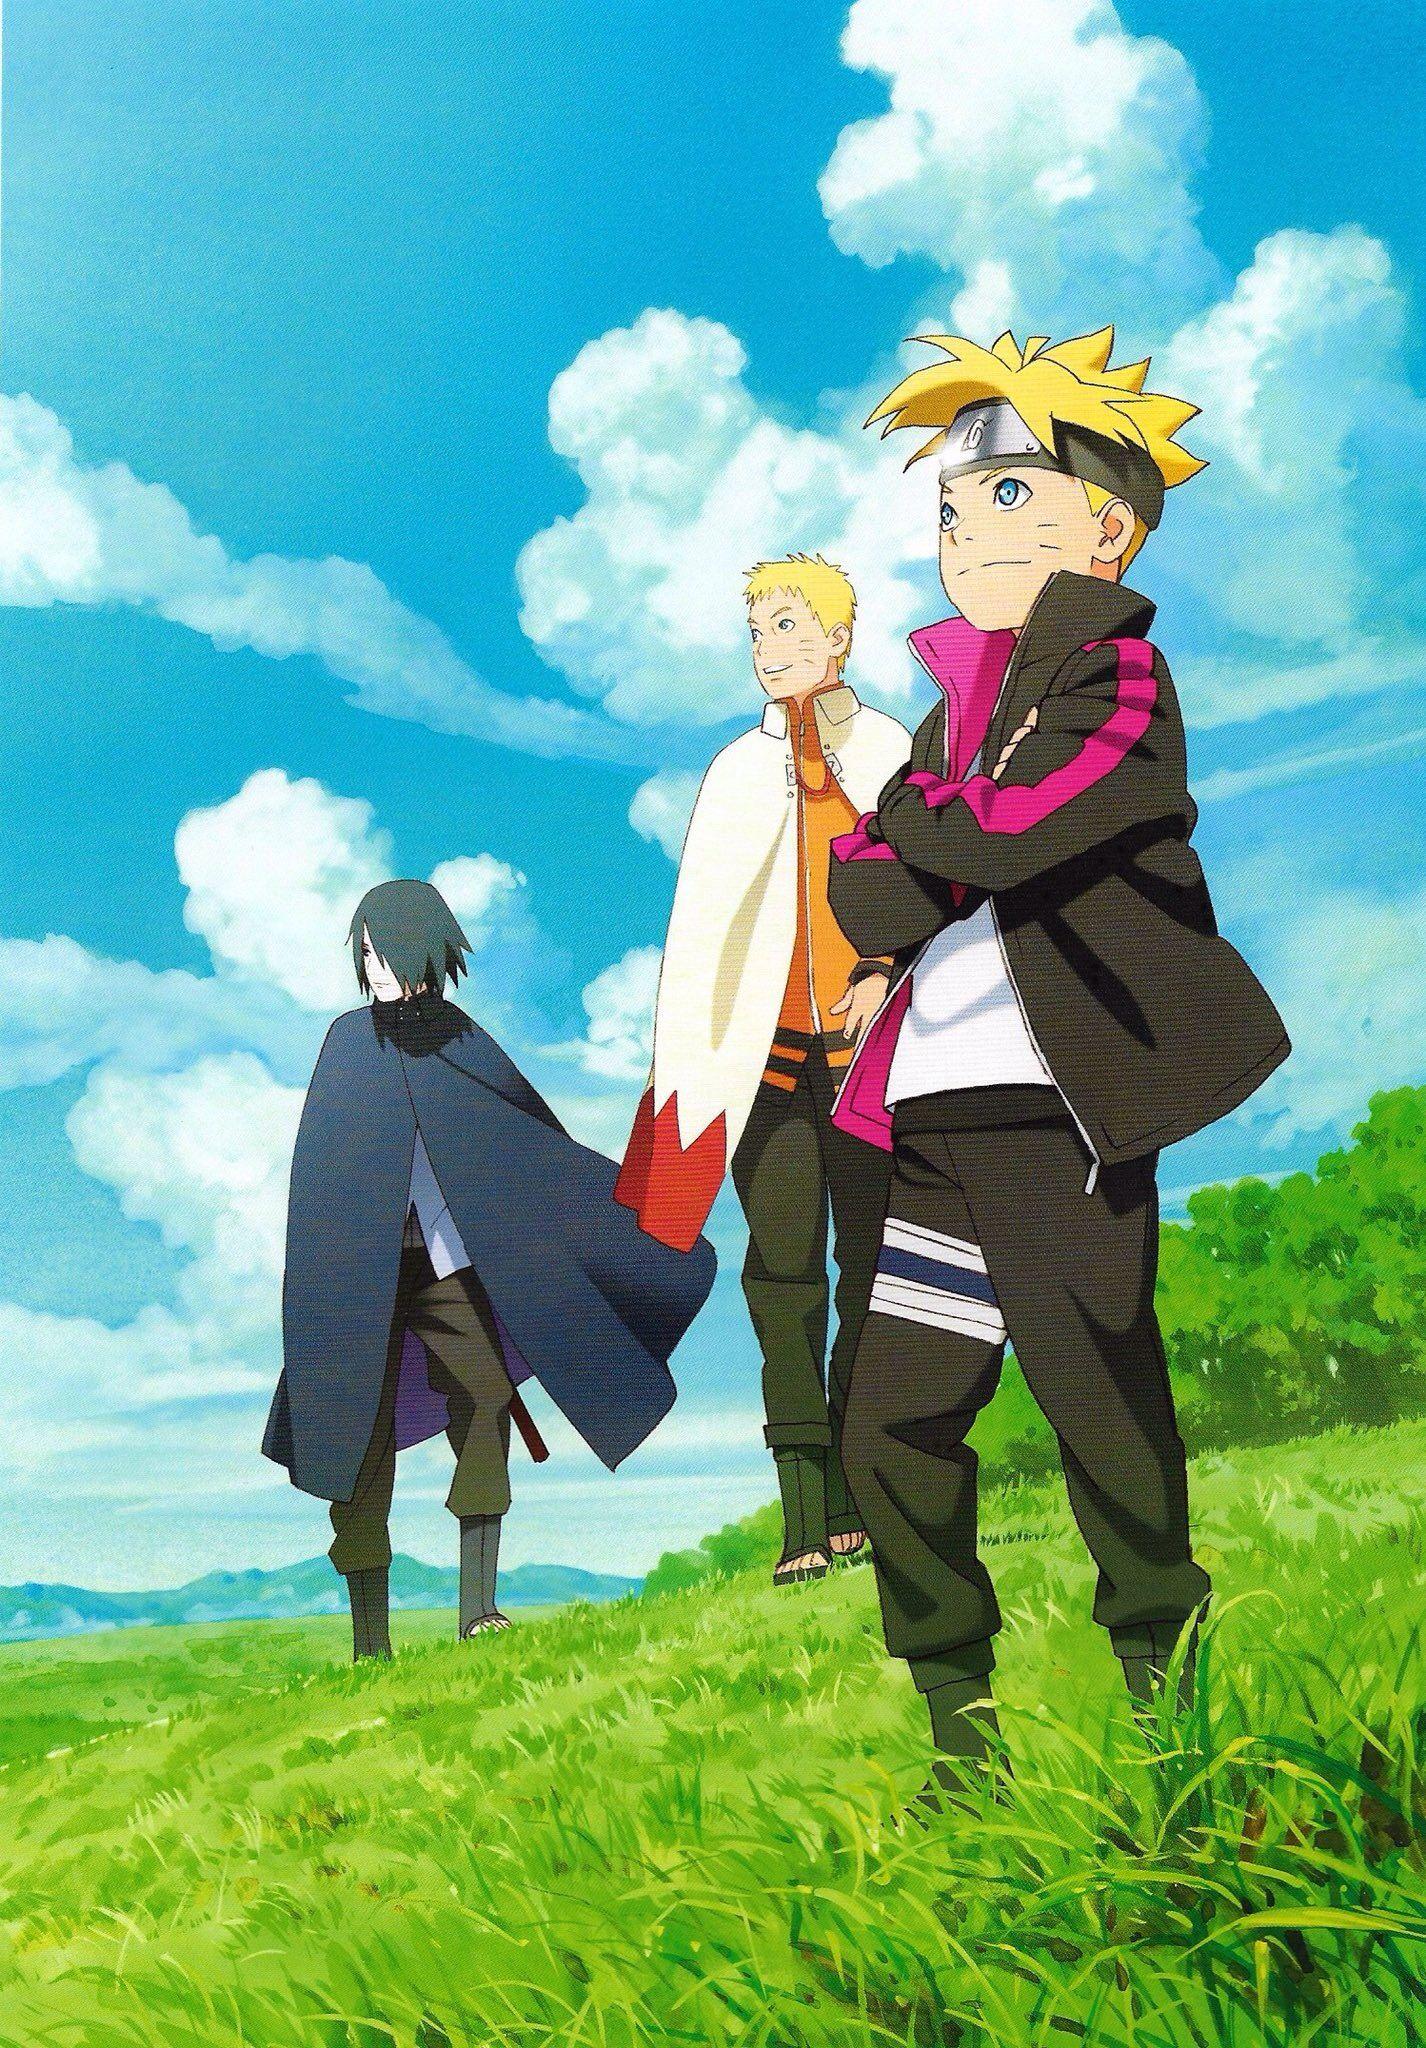 Sasuke And Naruto Boruto Gambar Karakter Animasi Karakter Animasi